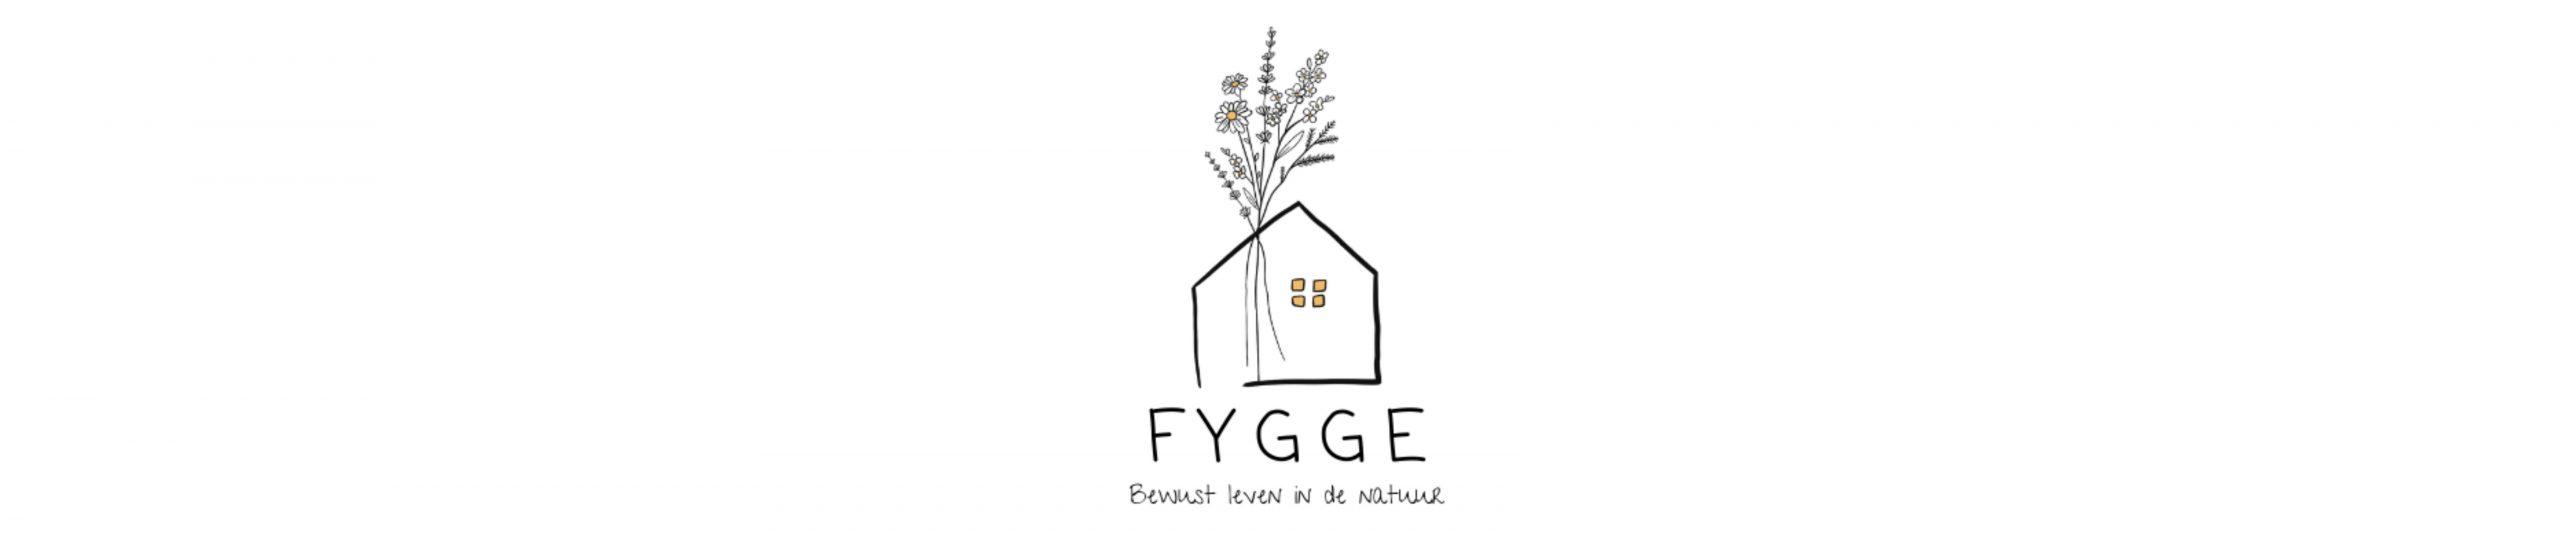 FYGGE